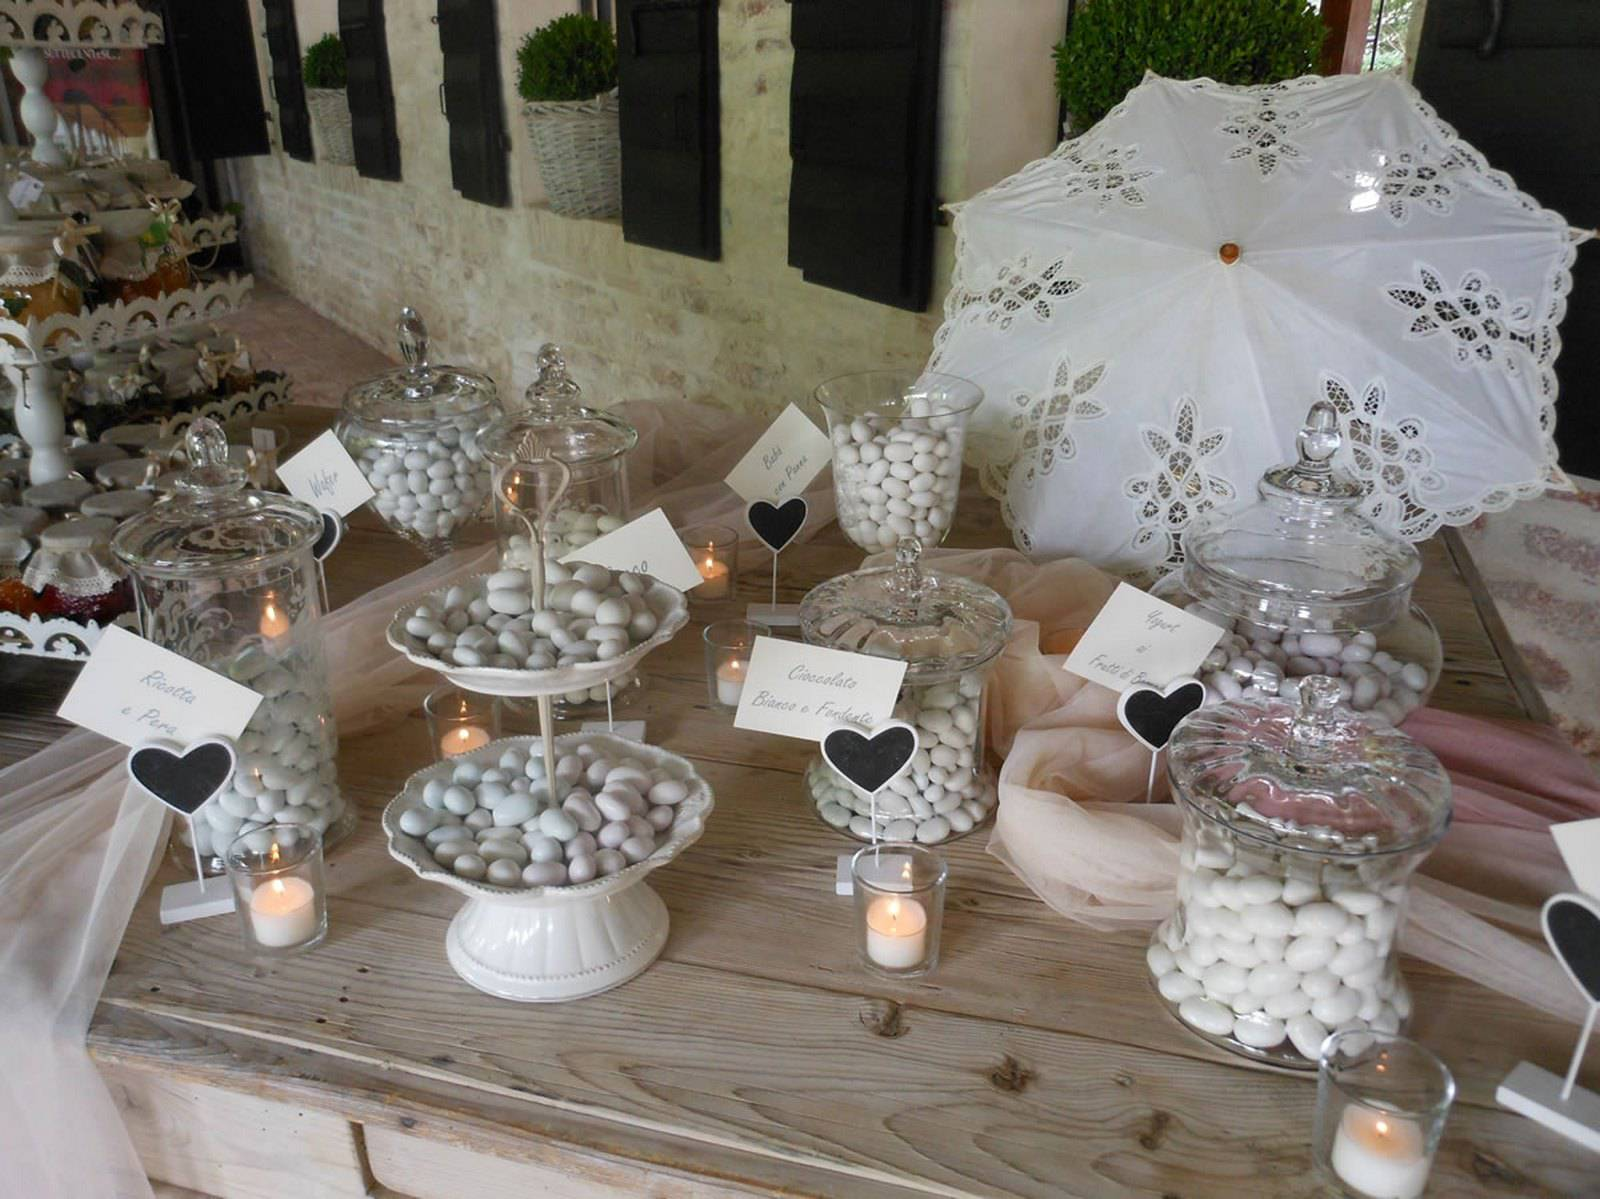 Matrimonio Country Chic Maison Mariage Wedding Planner : Matrimonio shabby chic maison mariage